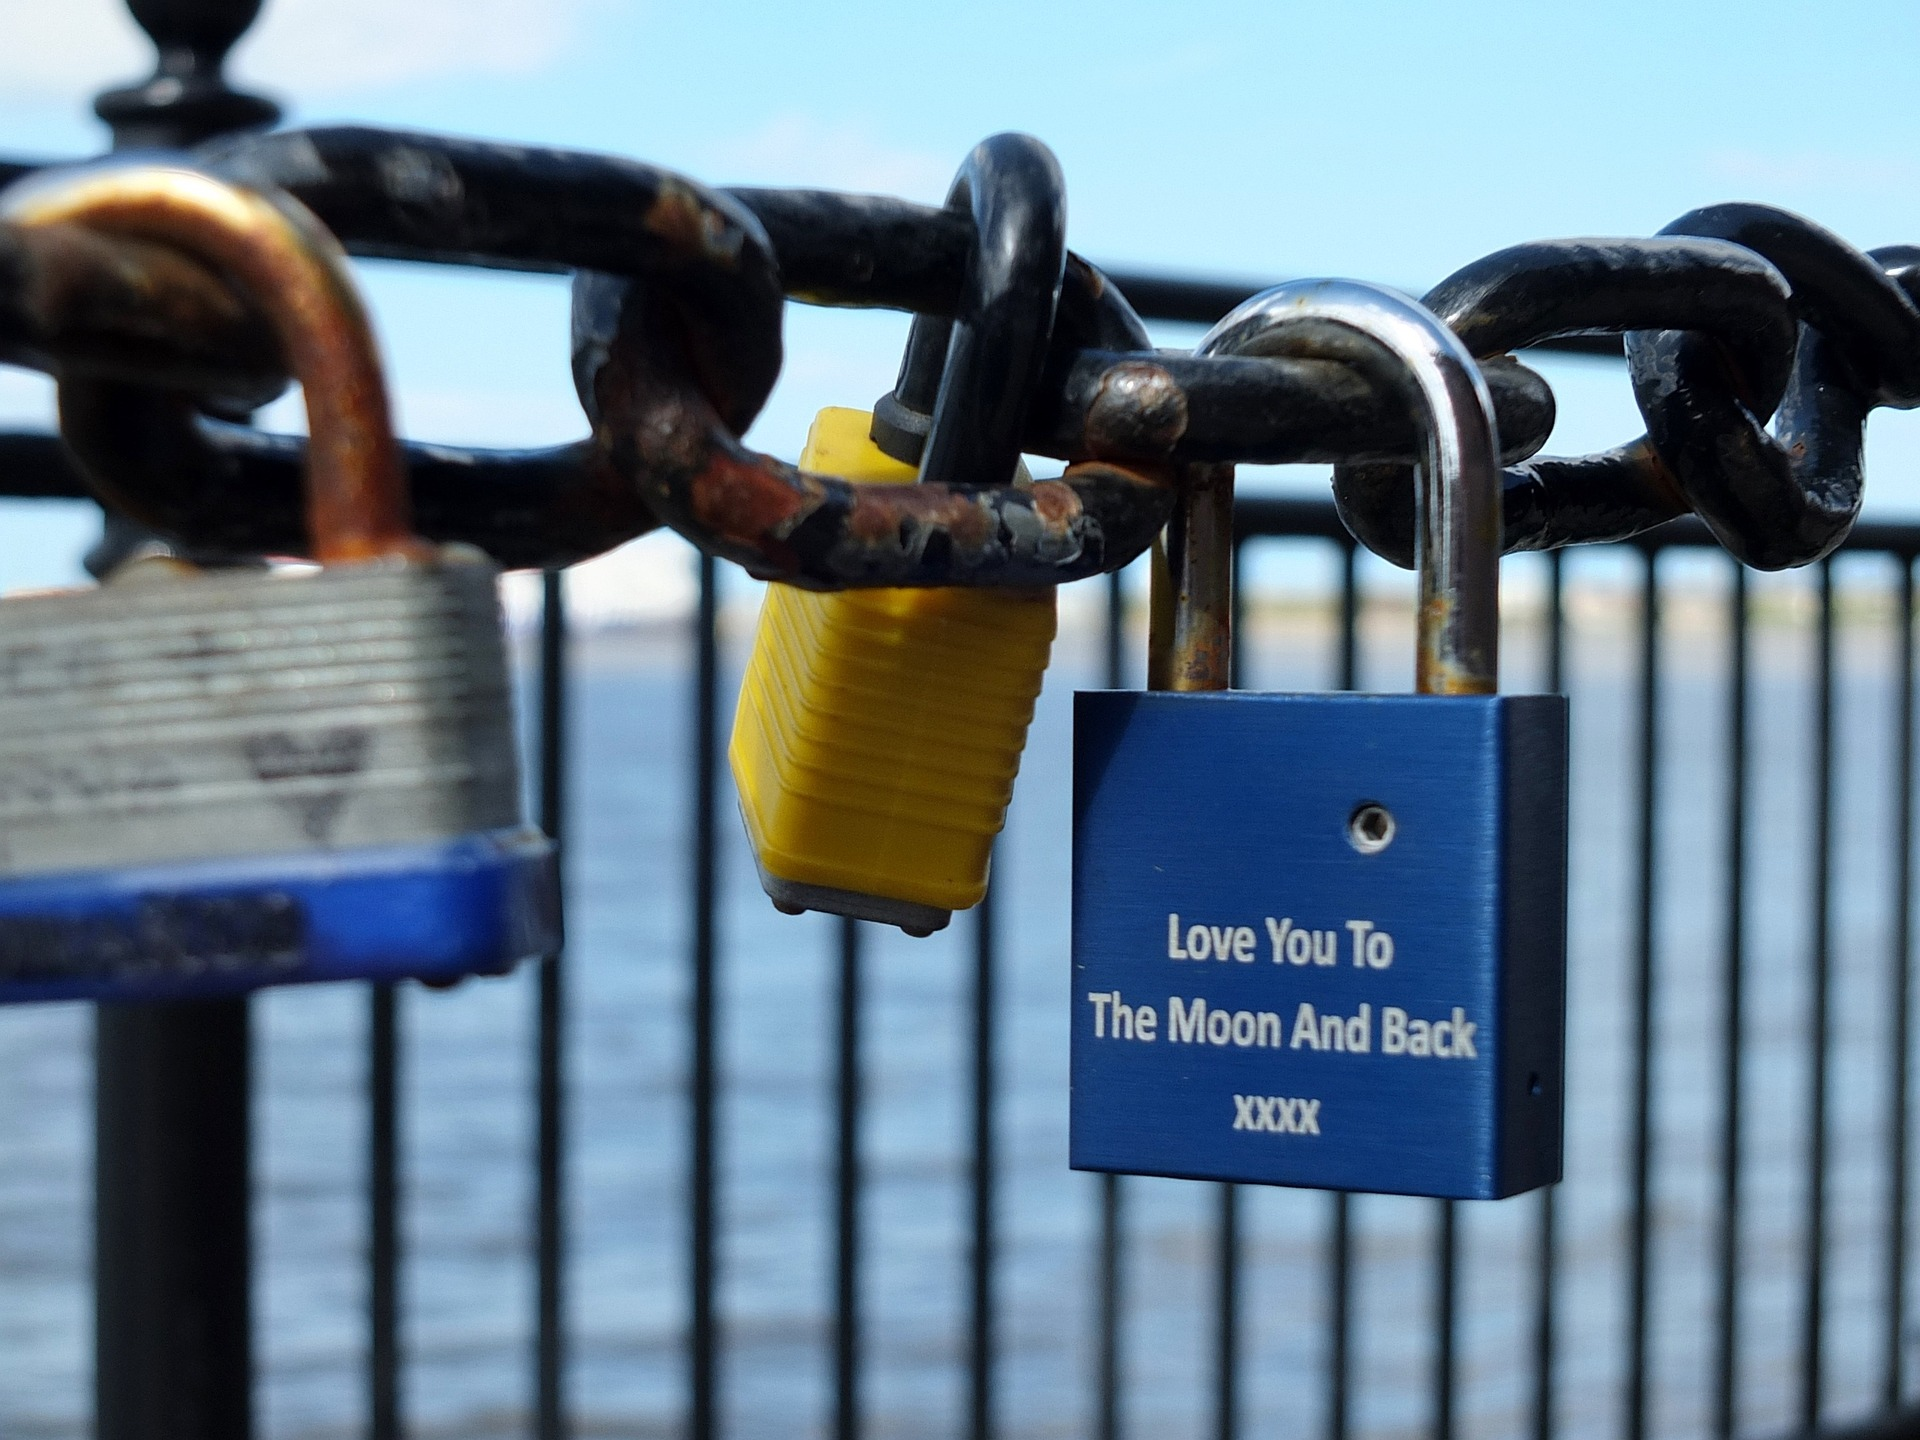 Loving Liverpool - Locks - WeddingsAbroad.com